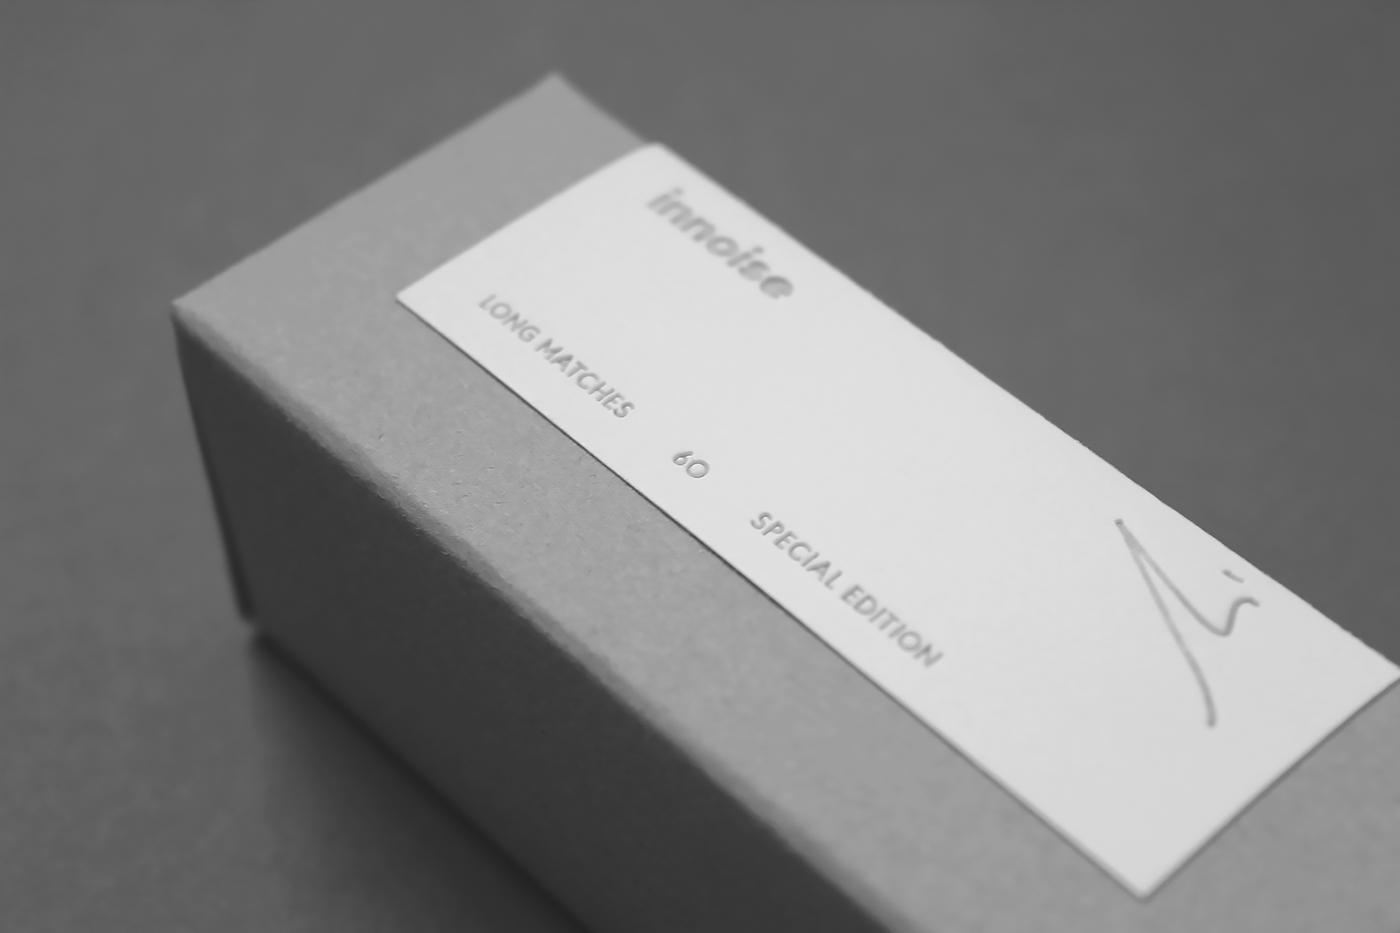 packing innoise jerry luk Matches Packing Design gray box black white Hong Kong Visual identiy